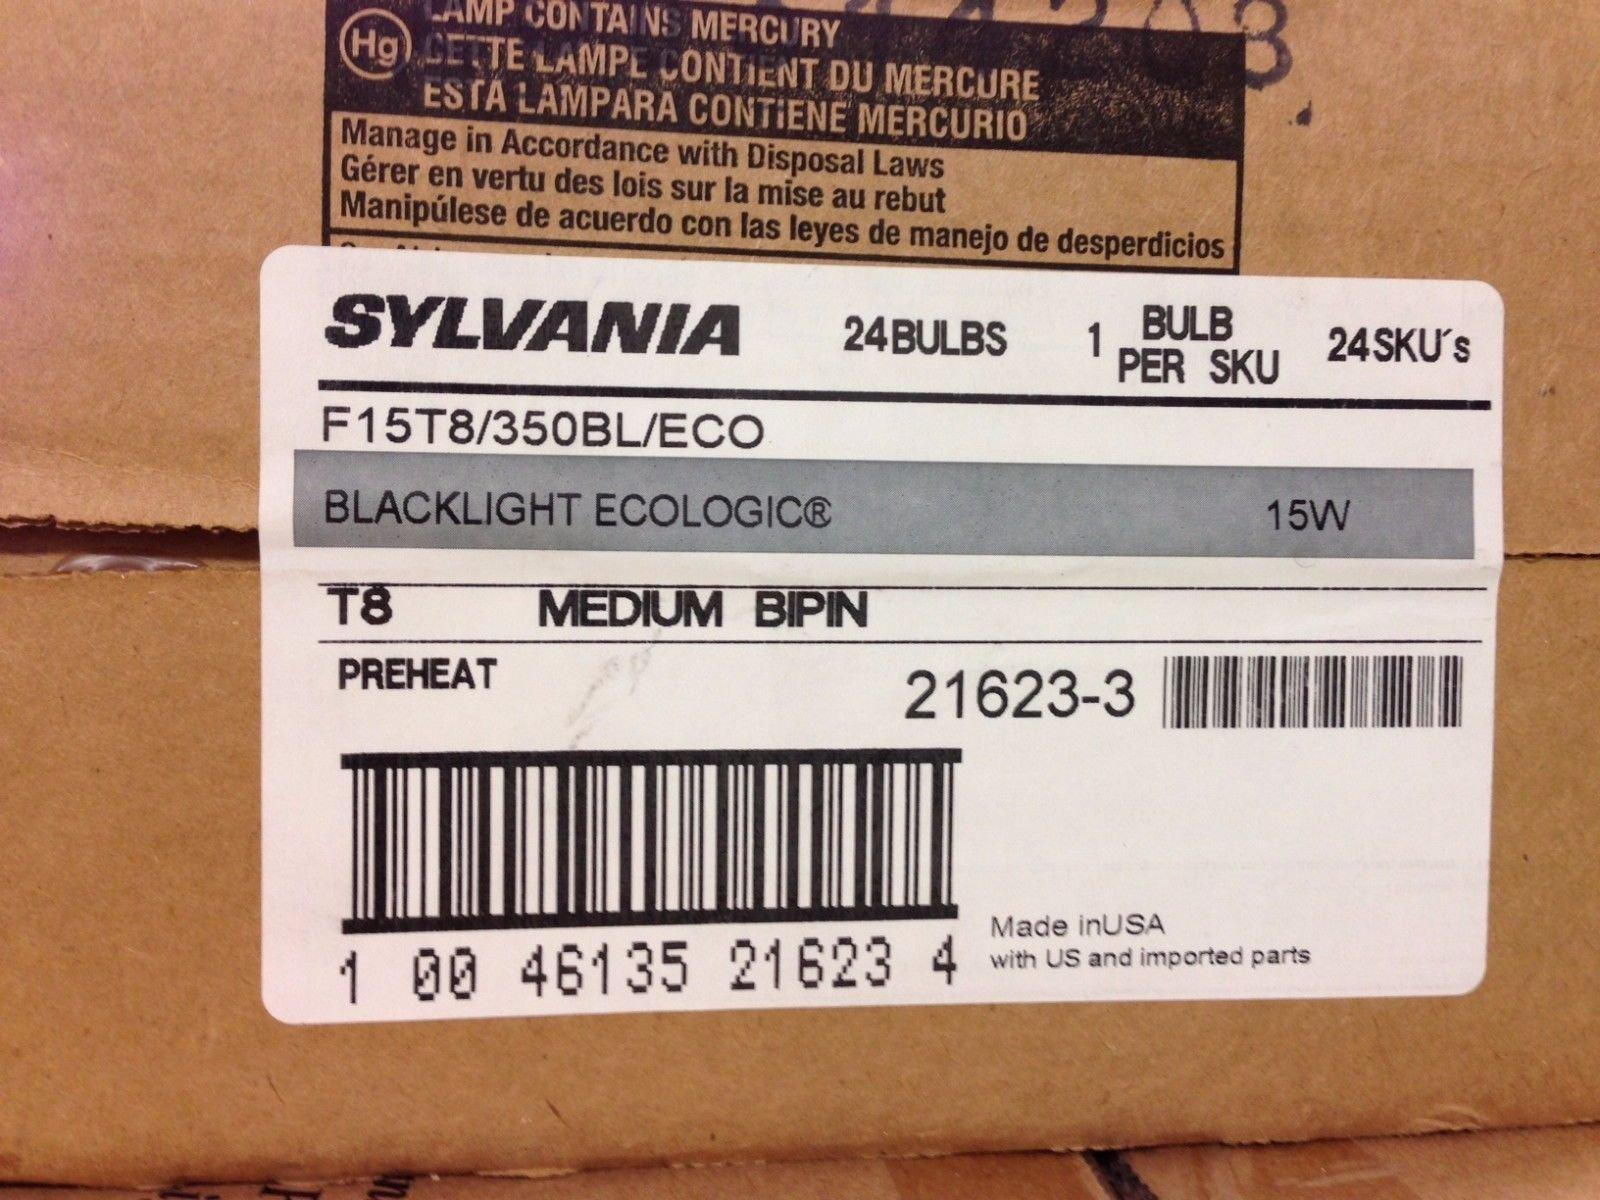 24 PIECES SYLVANIA F15T8/350BL/ECO 21623 15W T8 MEDIUM BI-PIN BLACK LIGHT